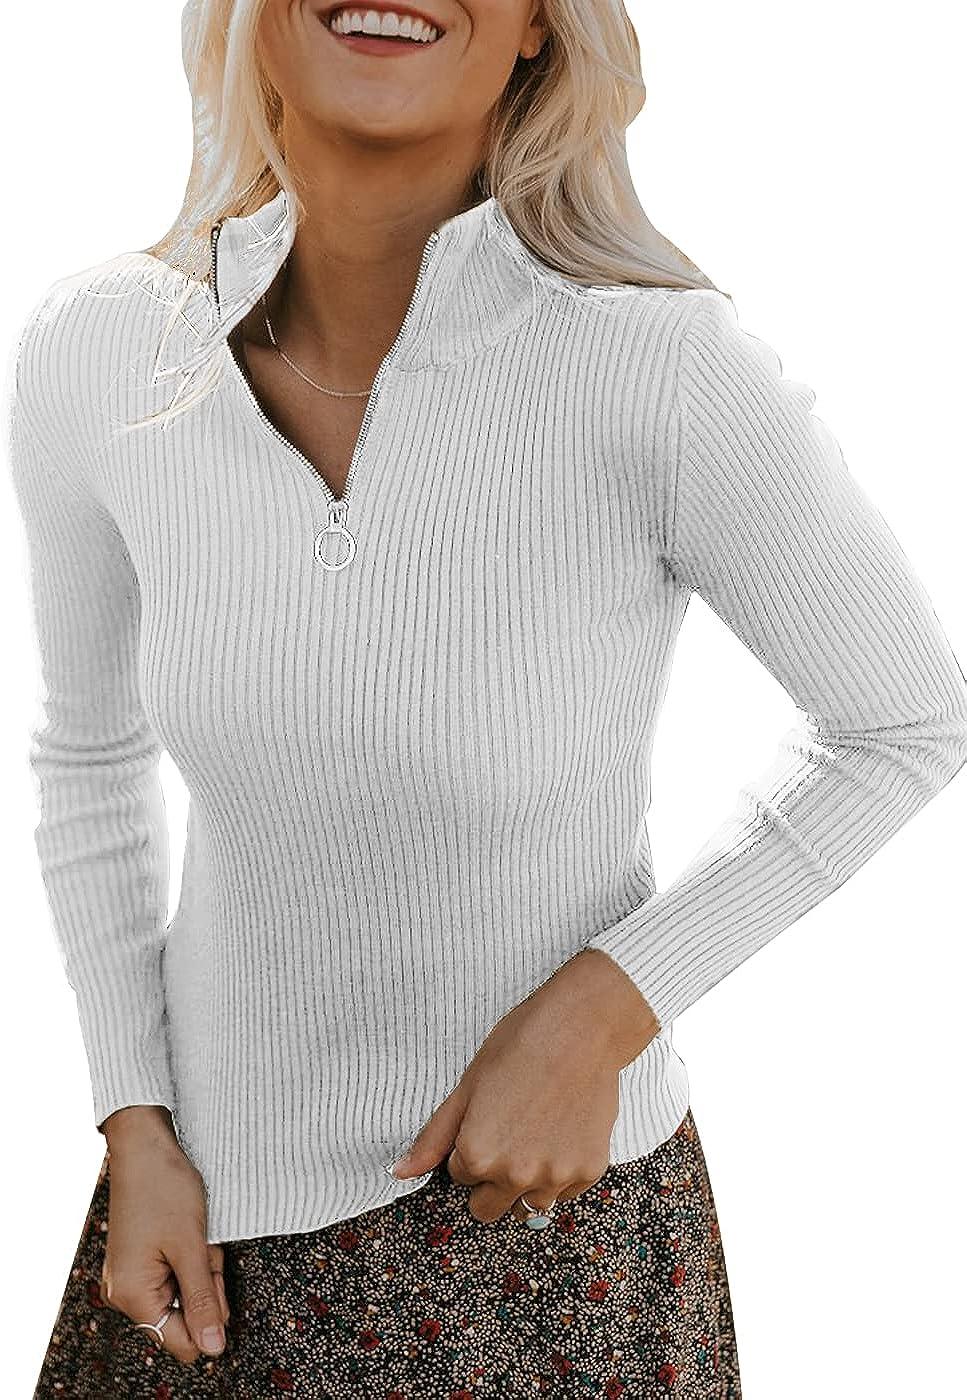 PRETTYGARDEN Women's Casual Long Sleeve Mock Neck Half Zip Slim Fit Knit Sweater Ribbed Knit Pullover Tops